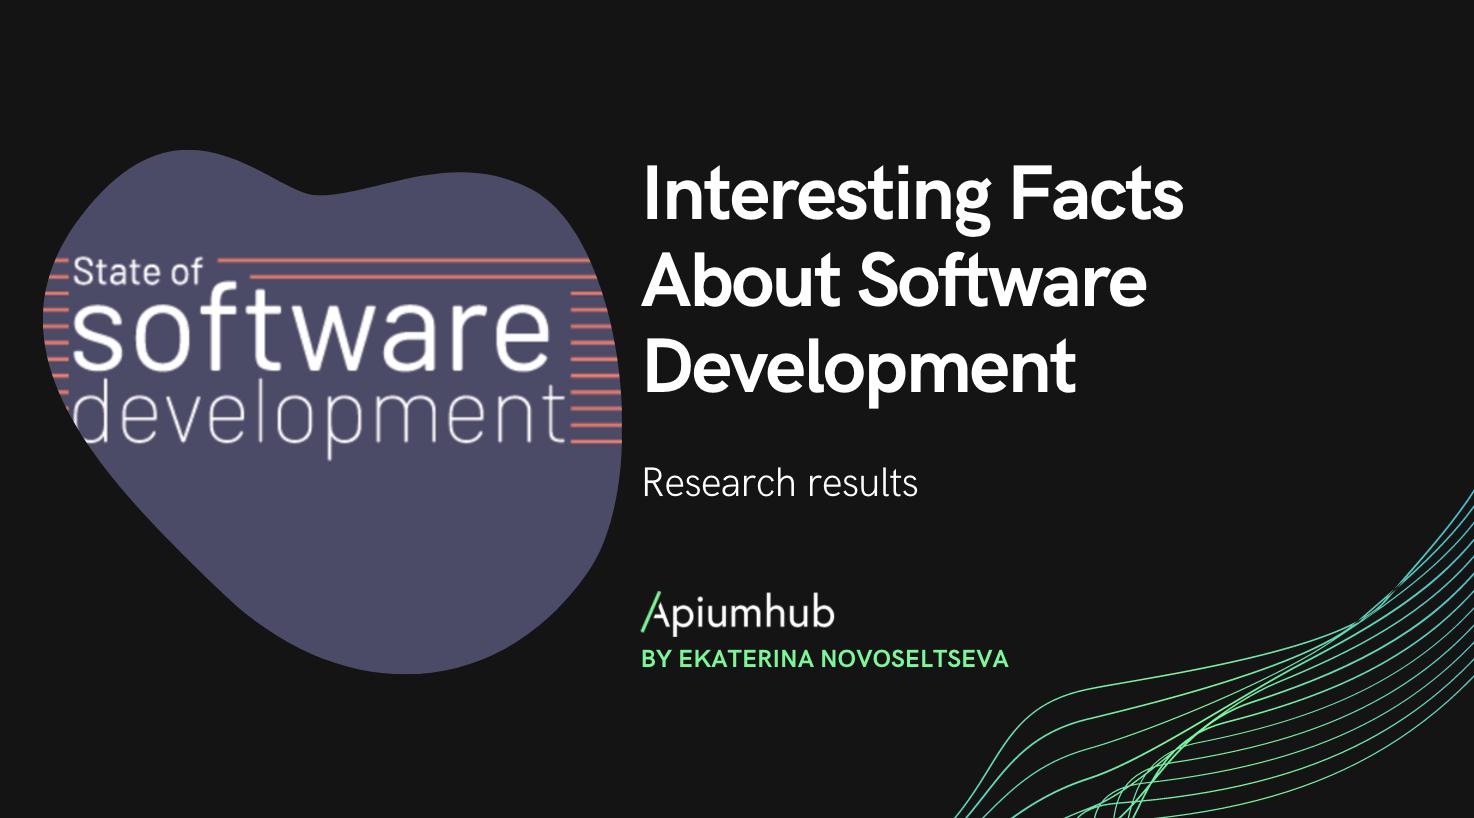 Interesting facts about software development: statistics